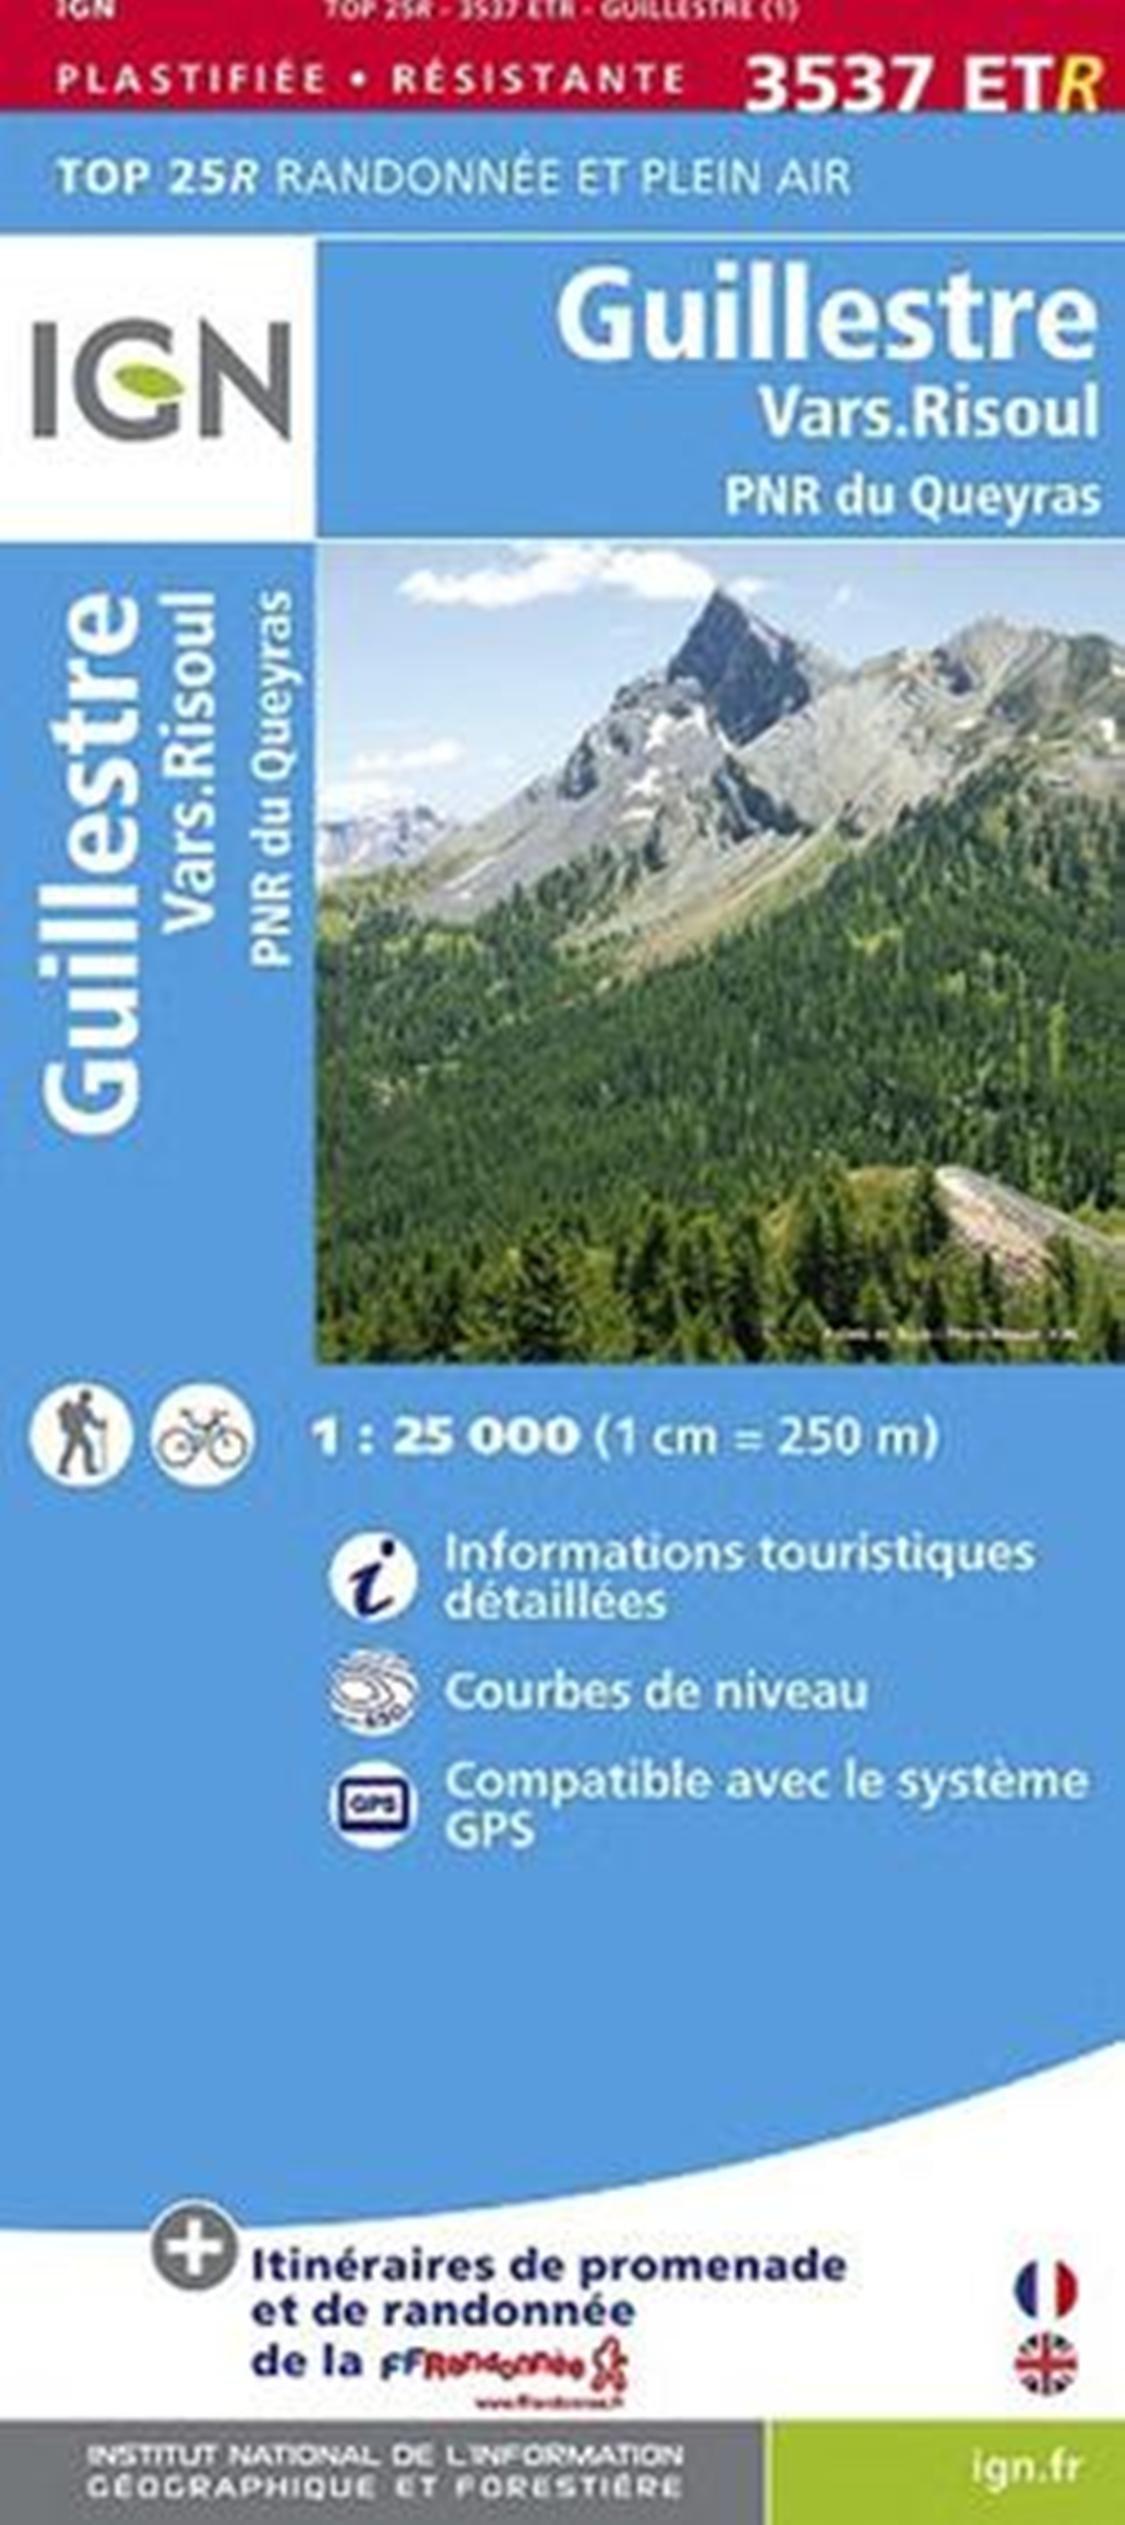 Guillestre / Vars Risoul / PNR du Queyras 2014: IGN.P.3537ETR (Ign Map)